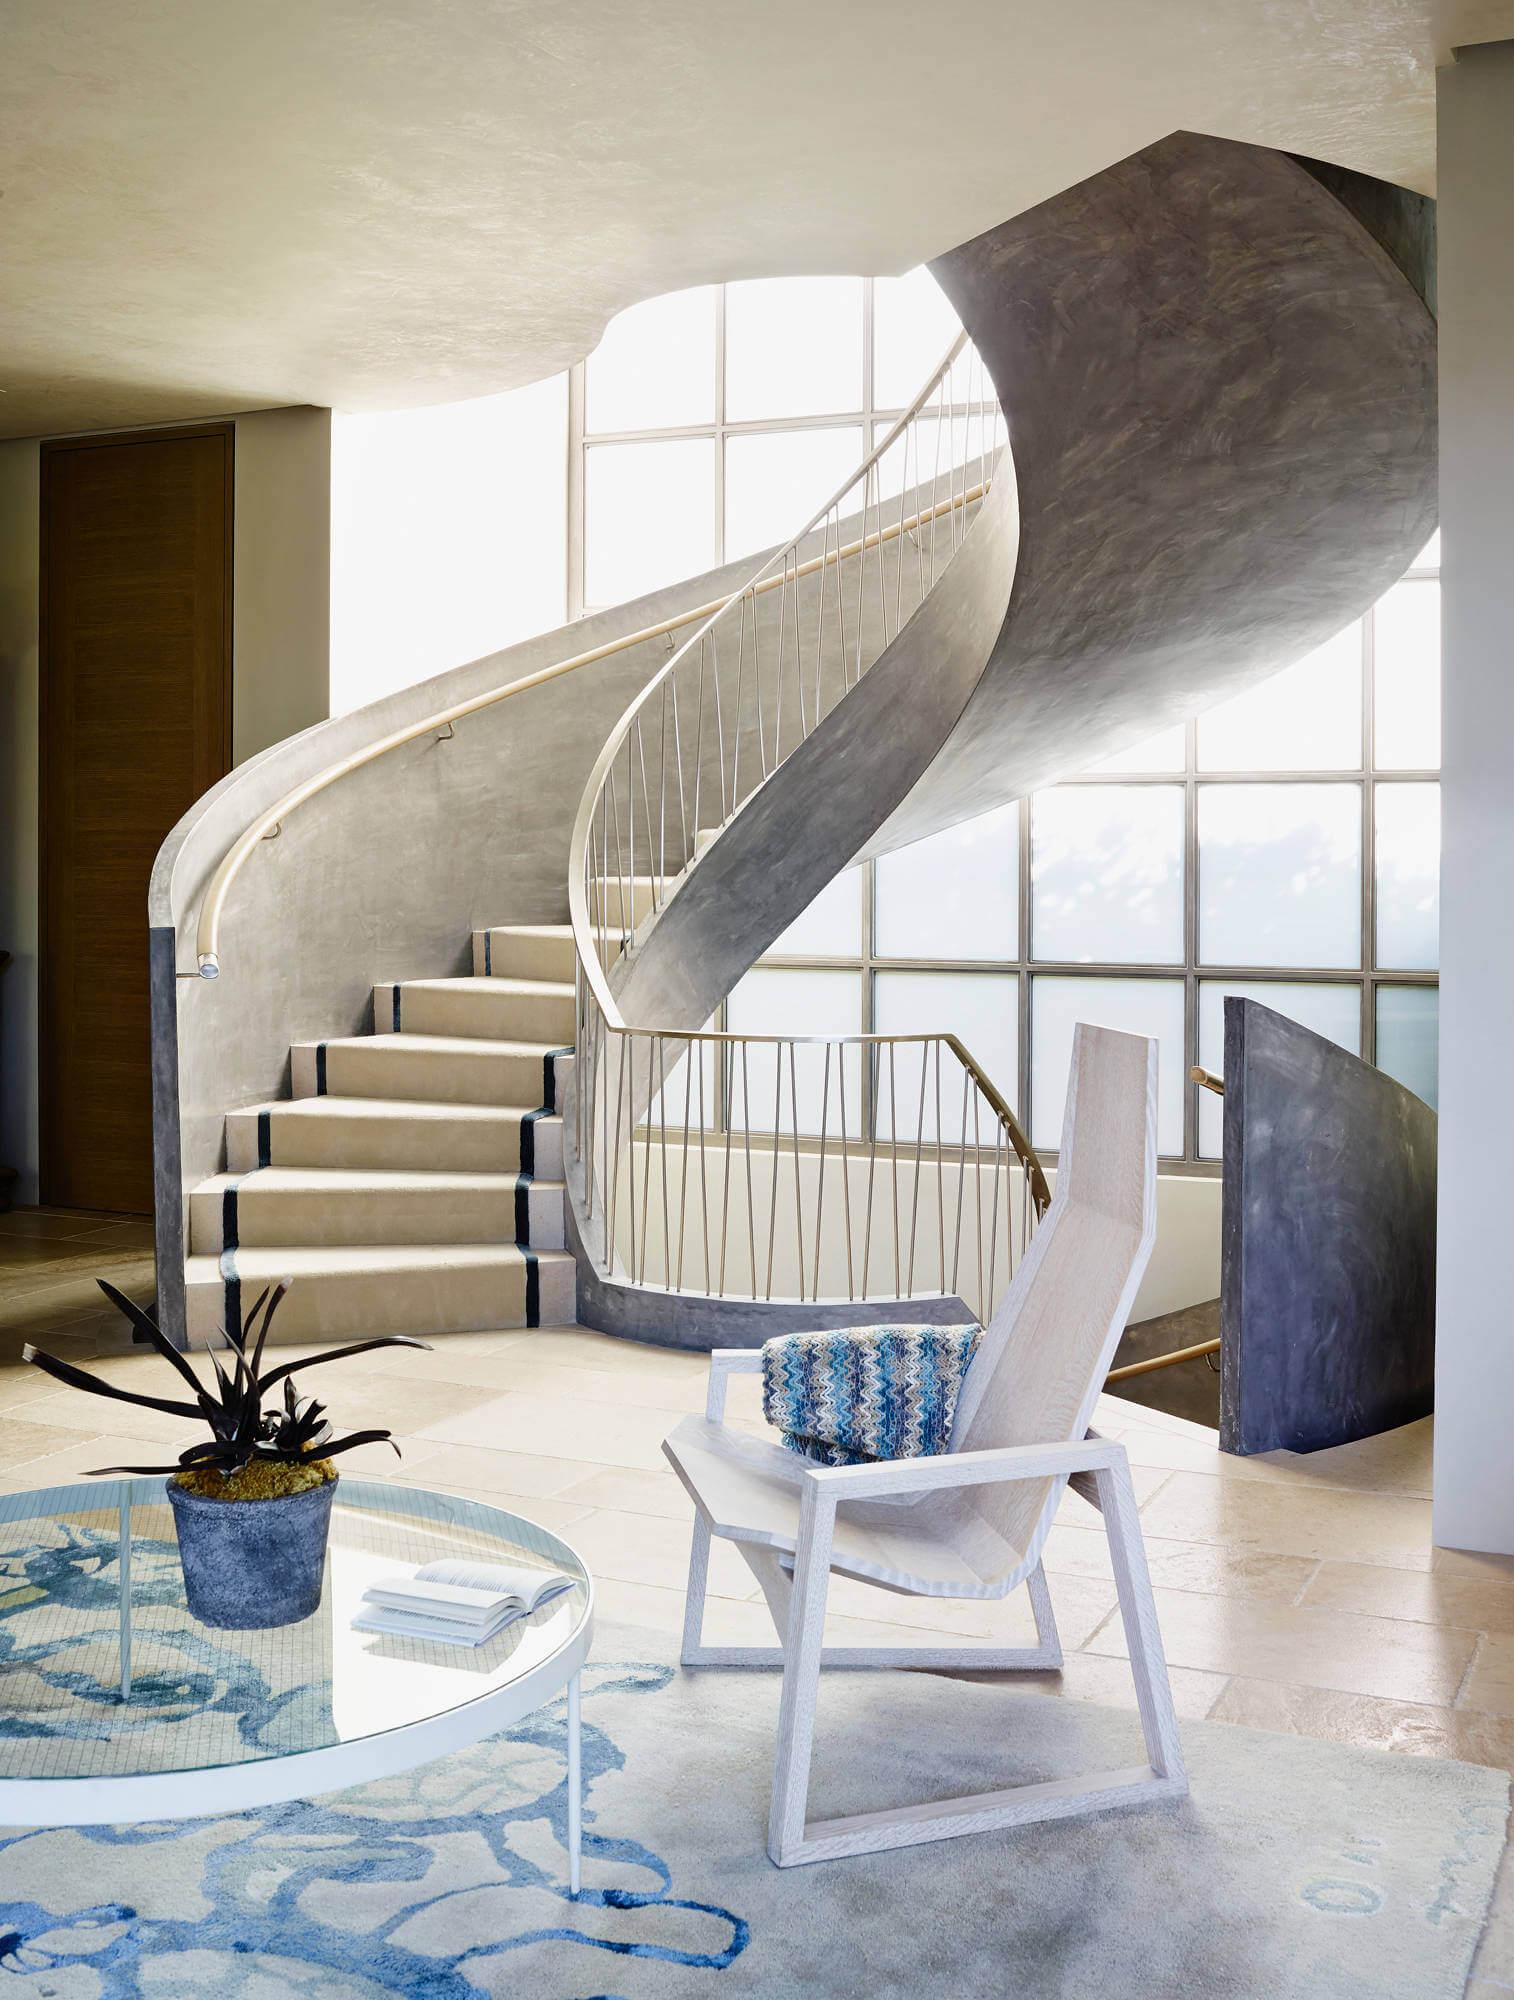 Mediterranean Coronado Residence near San Diego by Island Architects-03